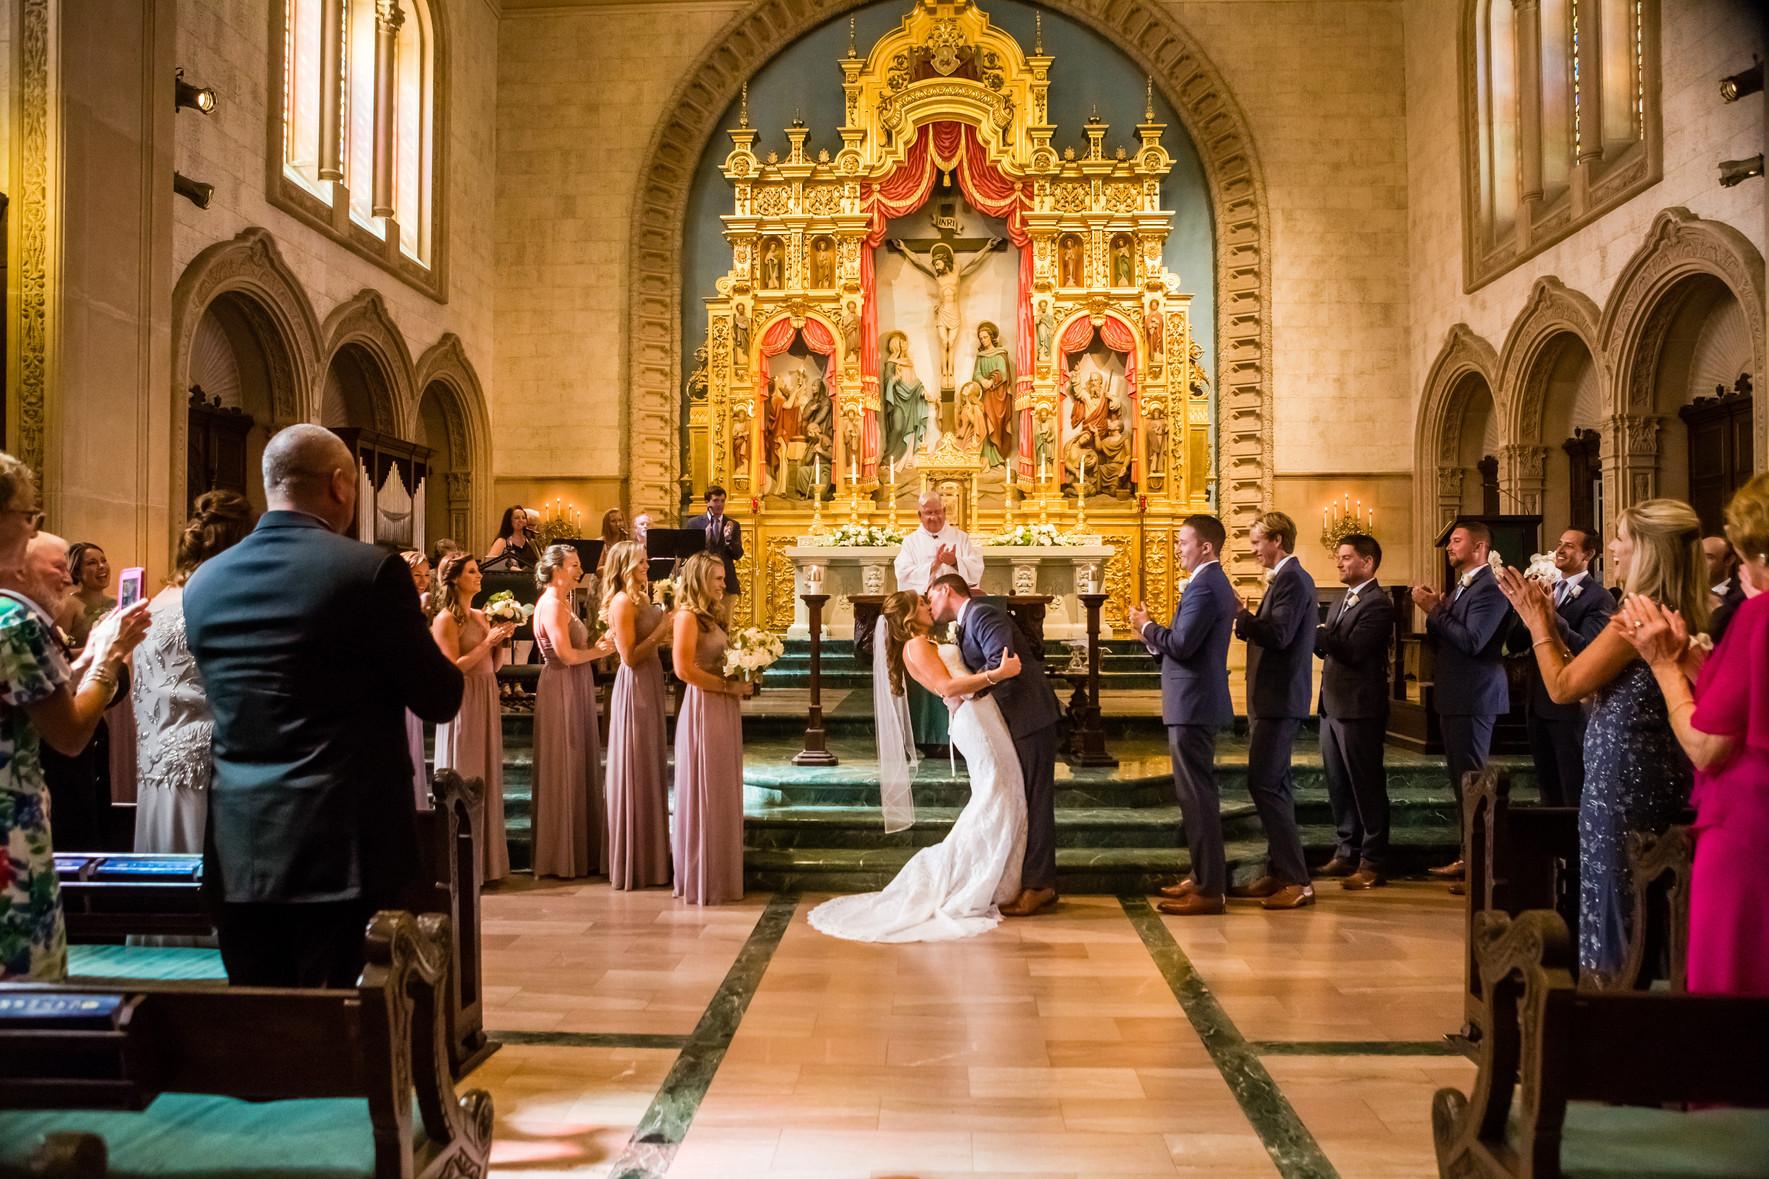 Berlynn Photography, San Diego Wedding Photography, Bride and Groom, San Diego Elopement, Adventure Wedding, Best Wedding Photography 2018, San Diego Church Wedding